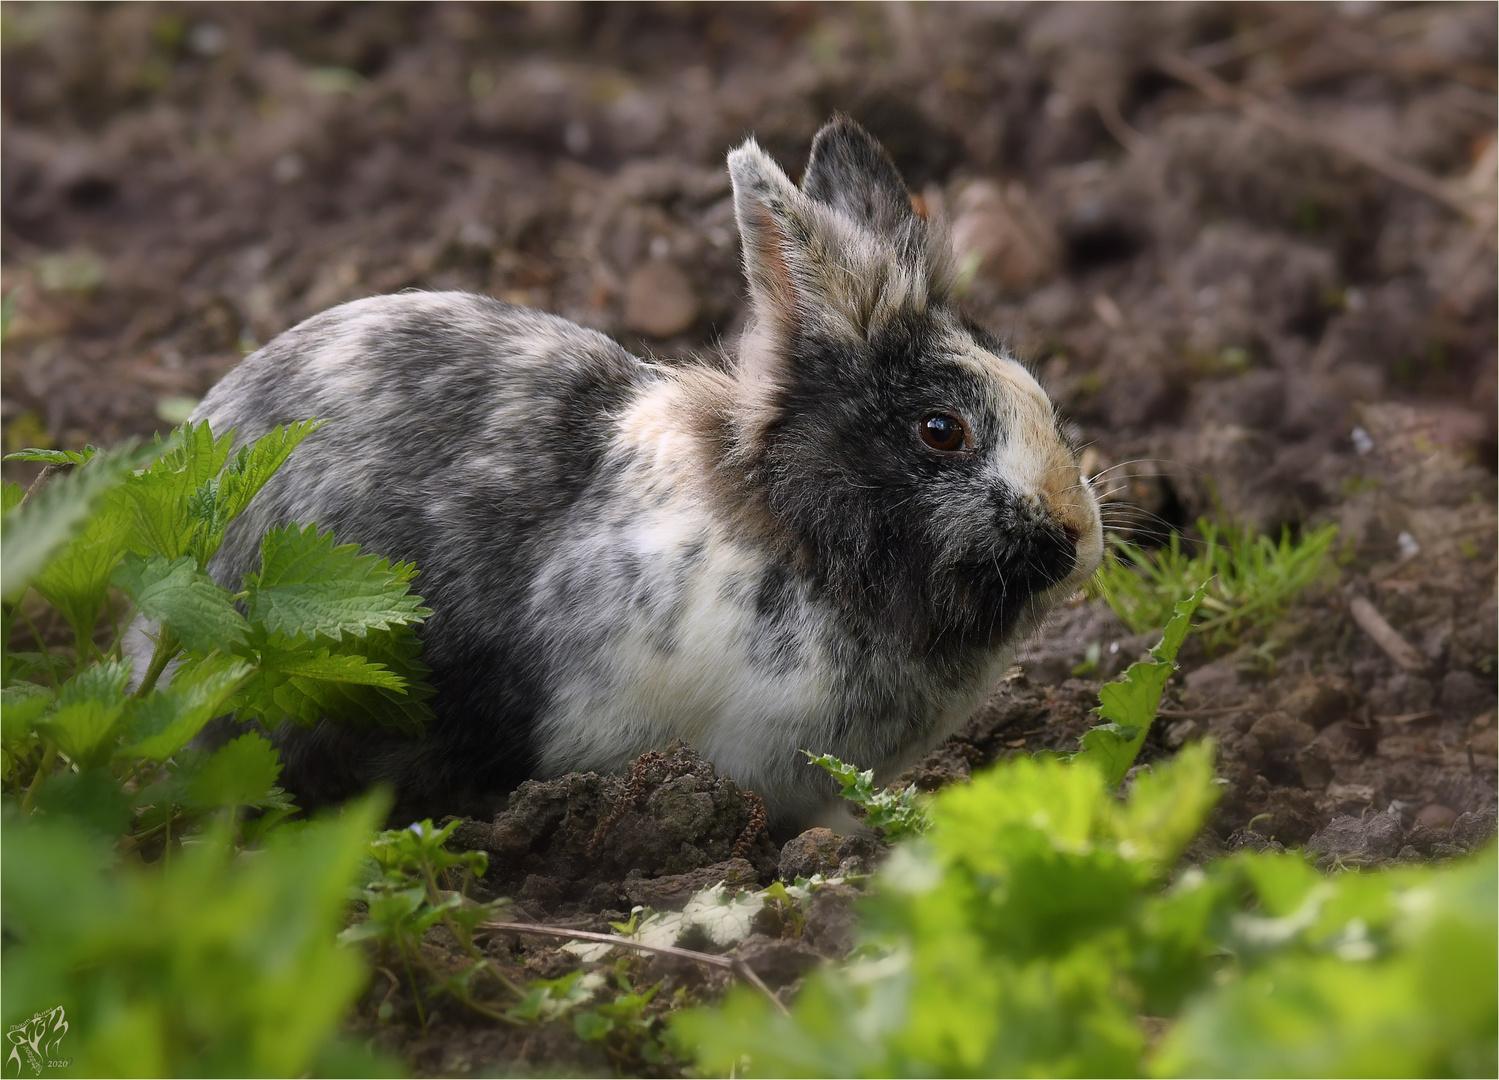 Rabbit in the wild ..